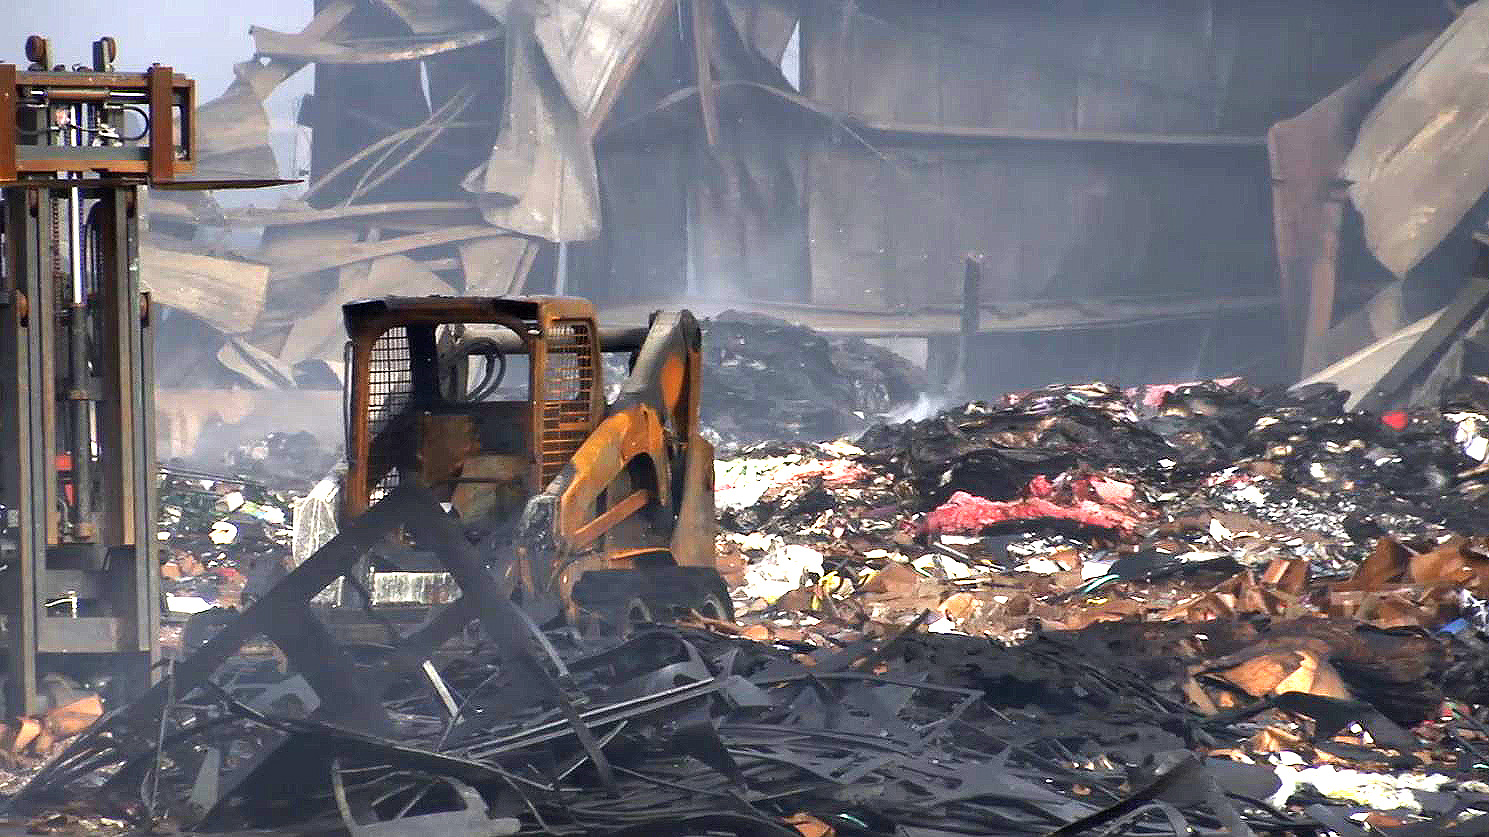 COVER PHOTO_Recycling Center fire debris_0503_1556916169663.JPG.jpg